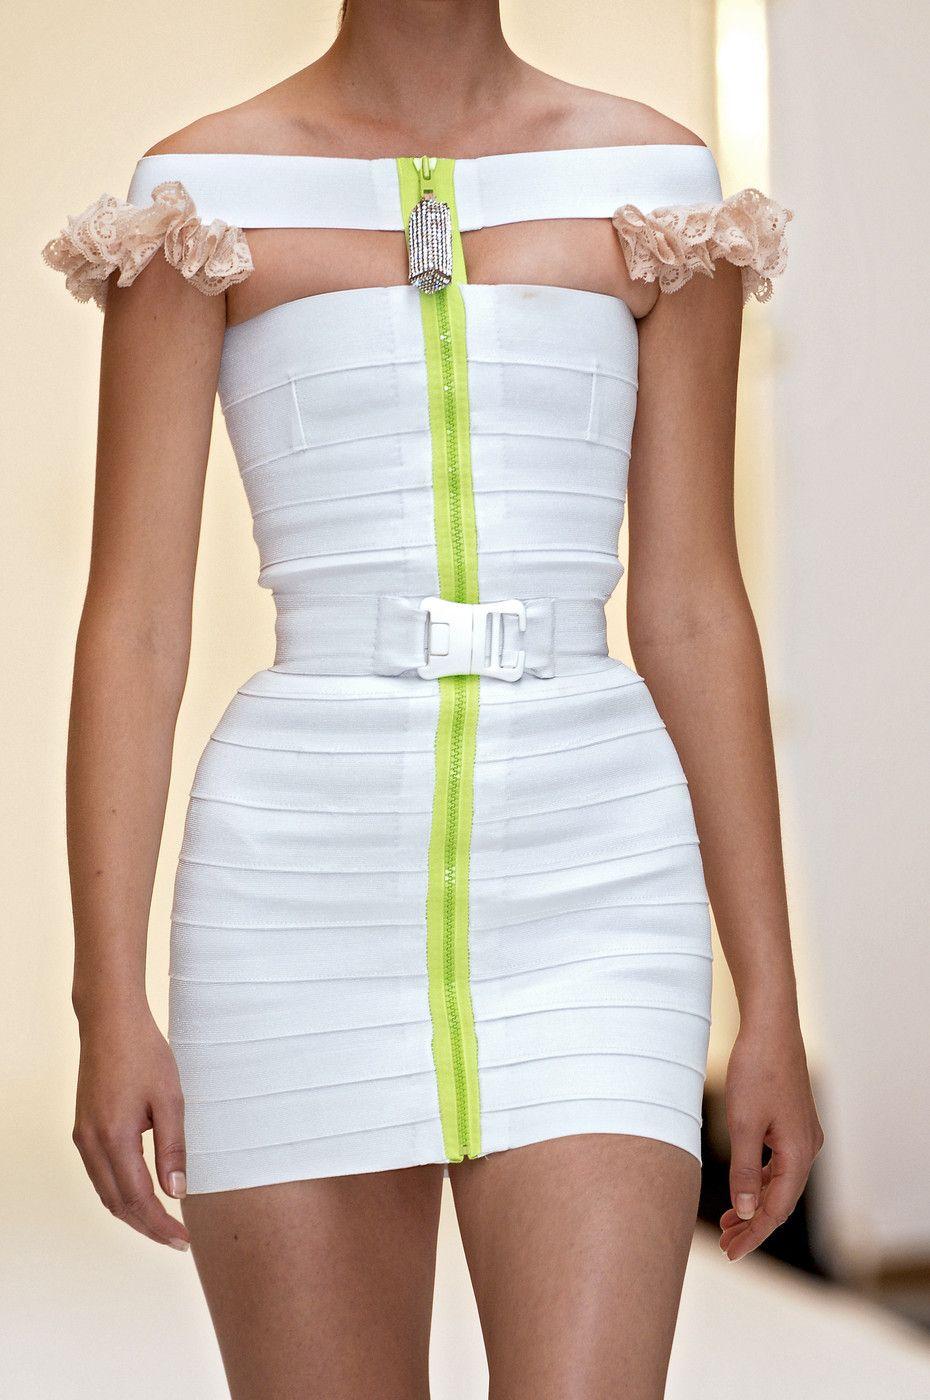 Christopher Kane RTW Spring'07 - #2007 #catwalk #christopher #couture #fashion #high #kane #rtw #runway #style #white